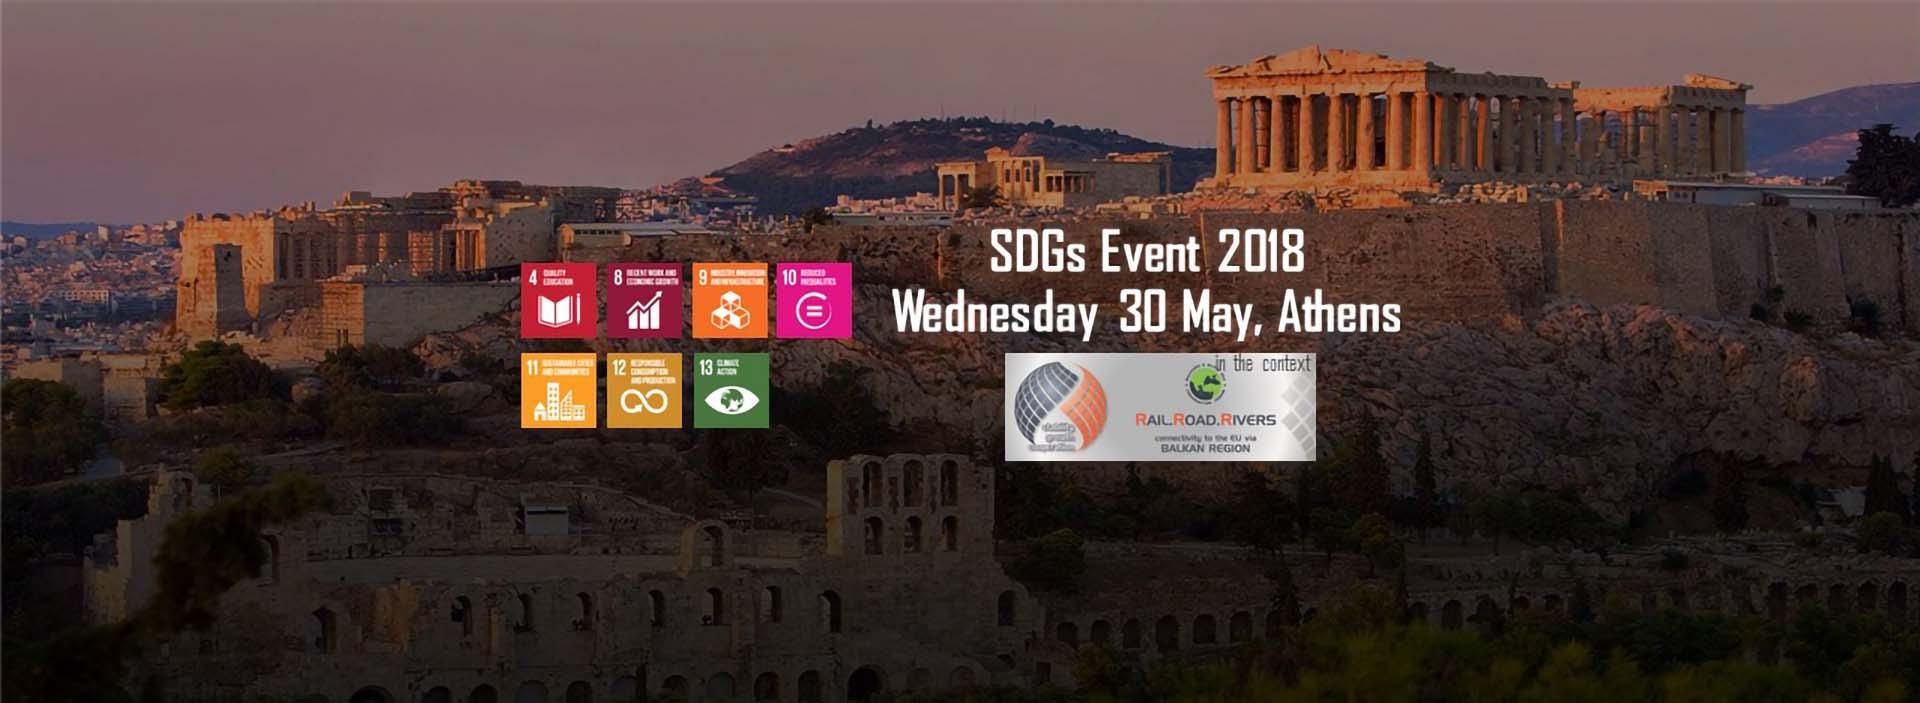 SDG_HEADER7-1